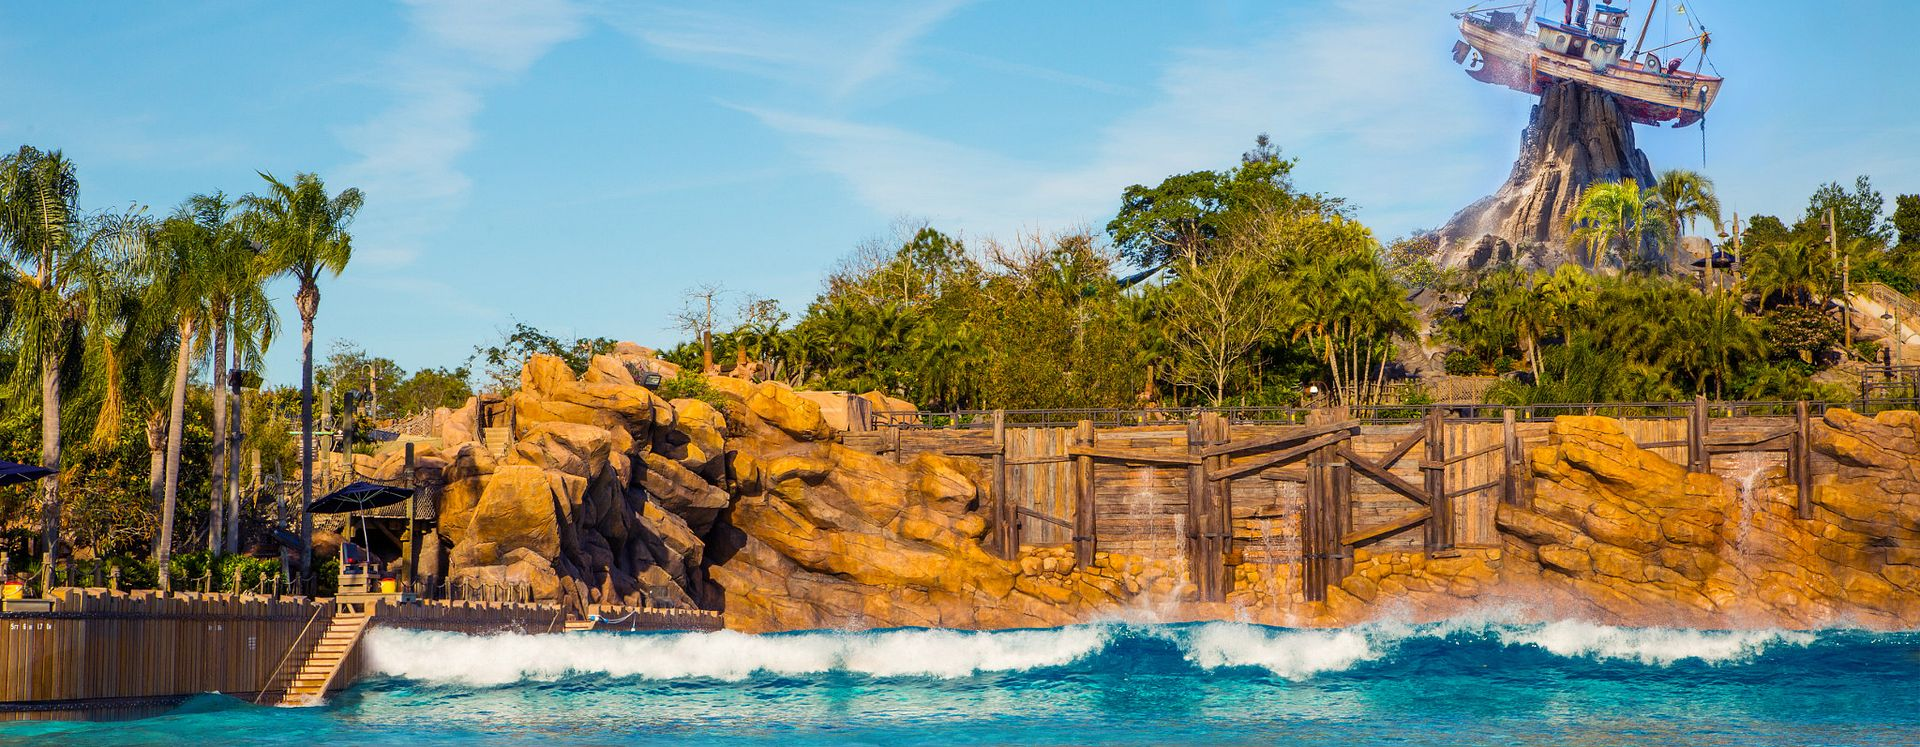 Piscina em parque aquático Typhoon Lagoon na Disney